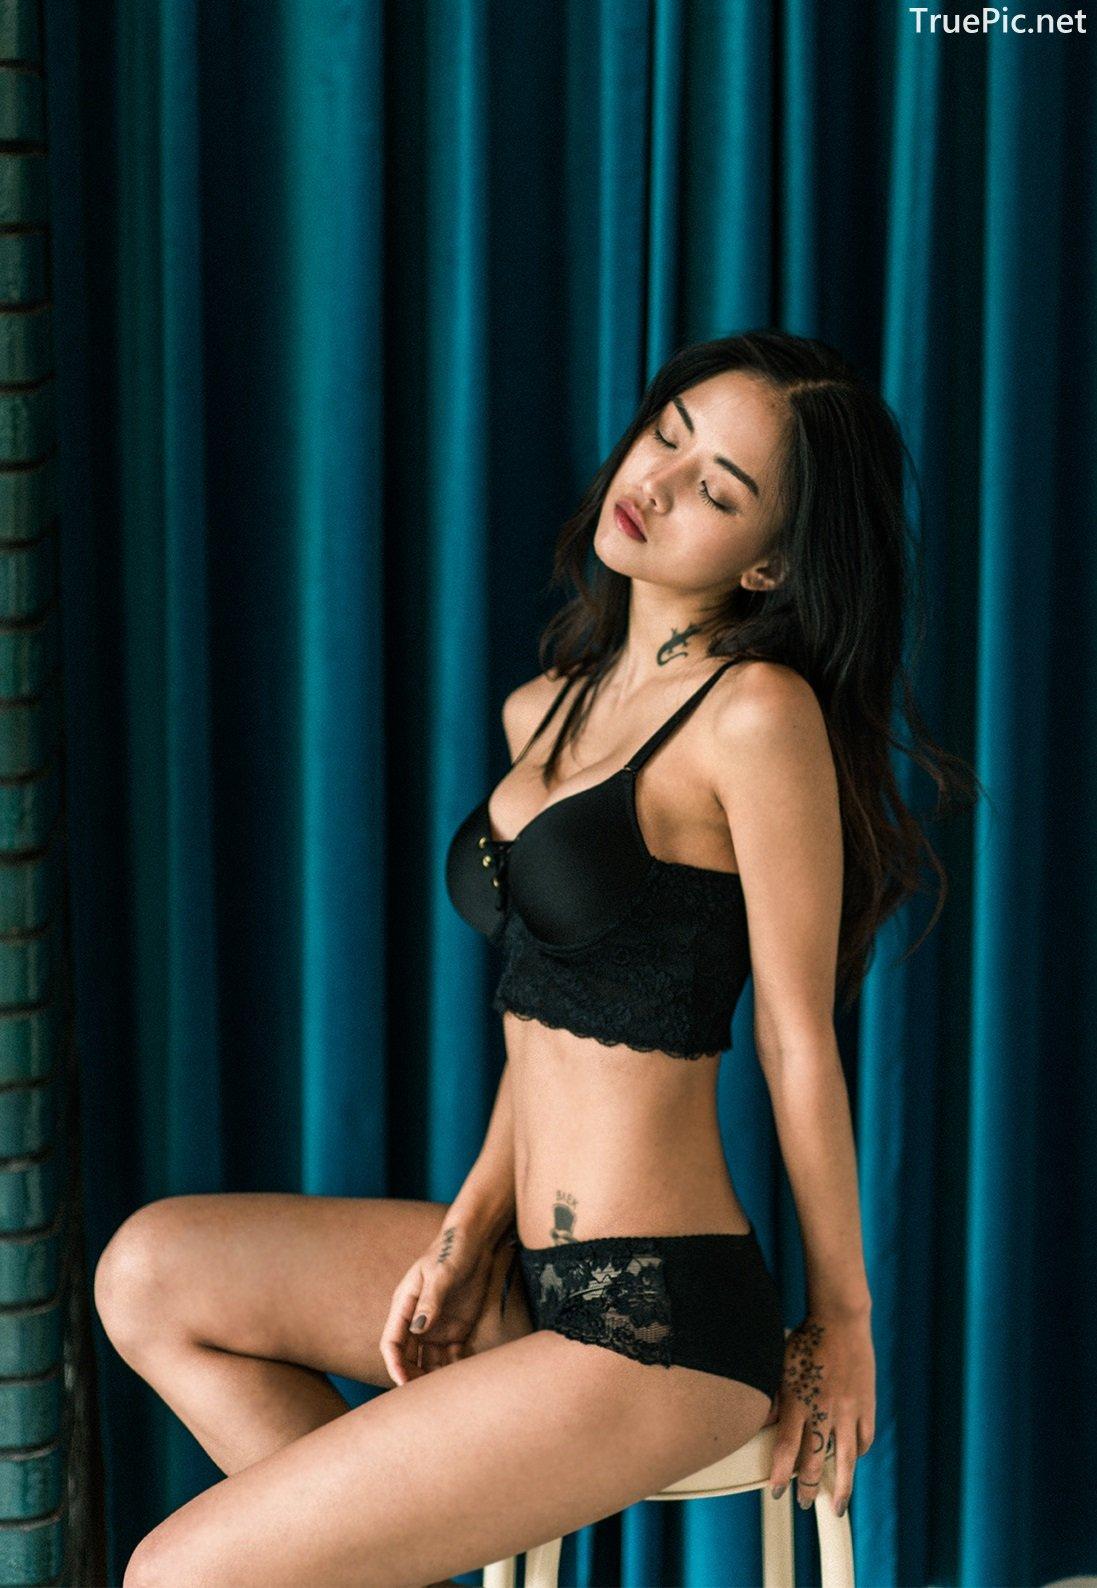 Image-Korean-Fashion-Model–Baek-Ye-Jin–Sexy-Lingerie-Collection-2-TruePic.net- Picture-2